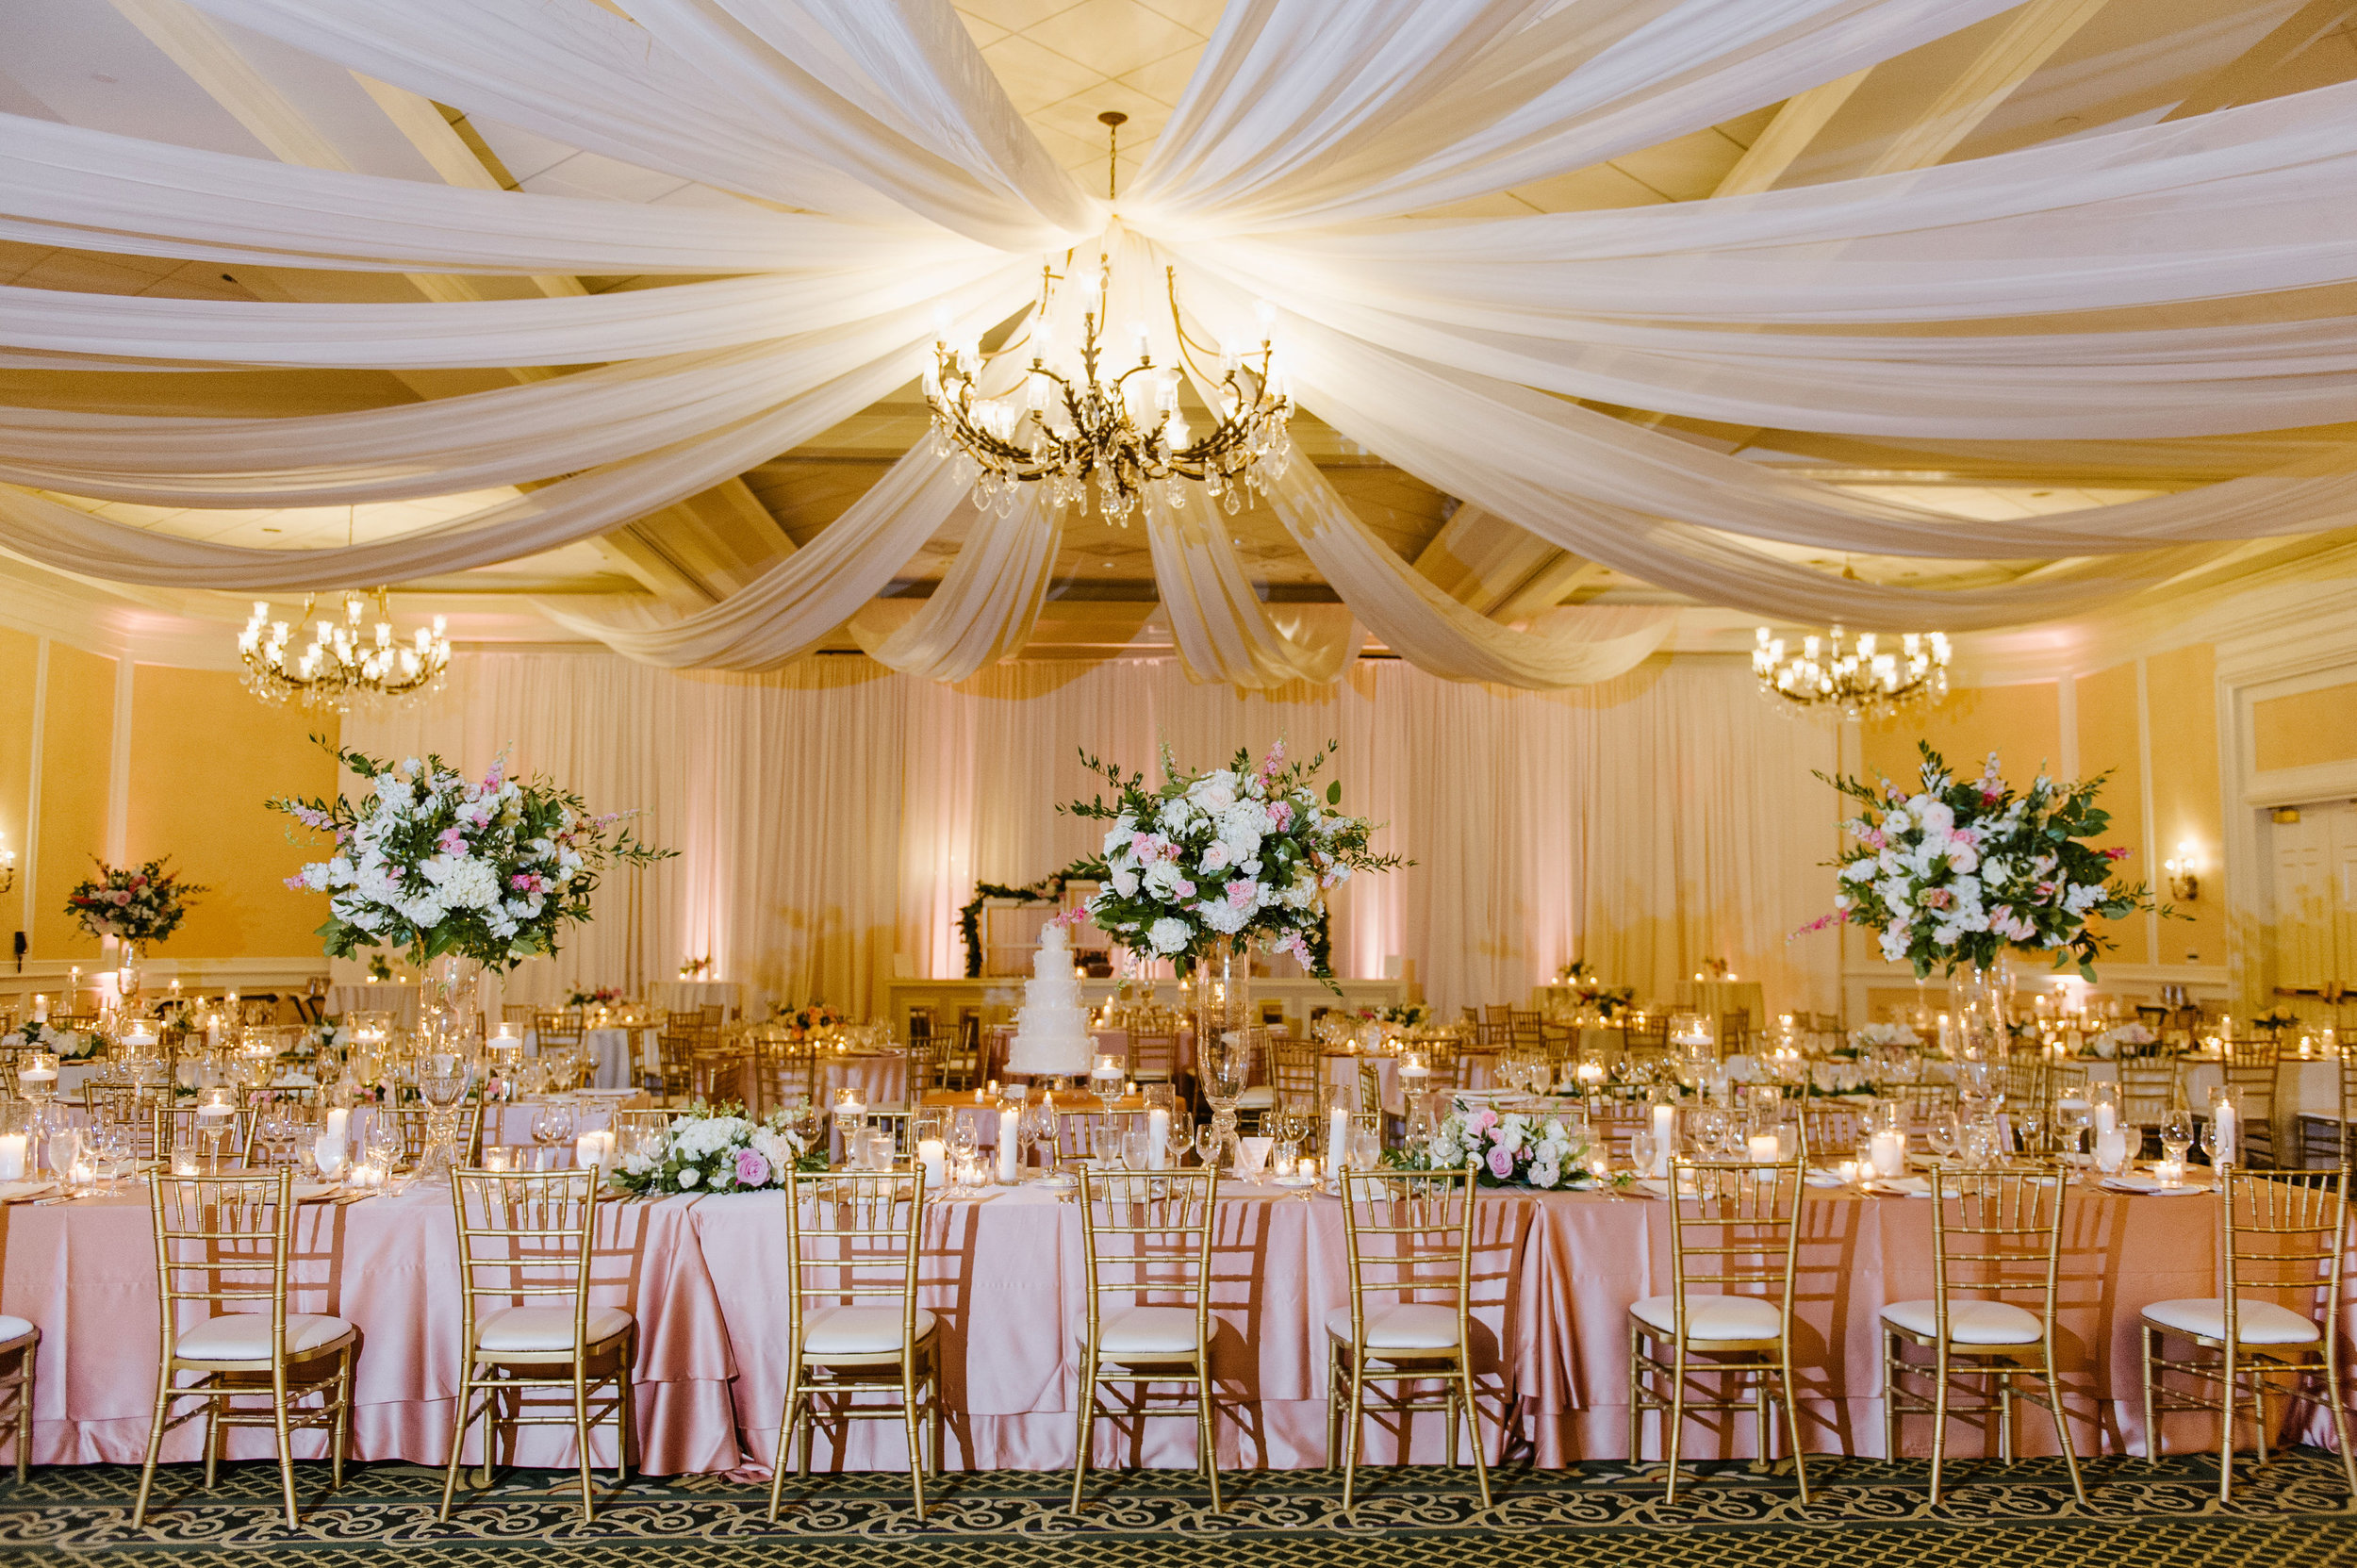 McElravey_Wedding_CarolineLimaPhotography_2018_269.jpg